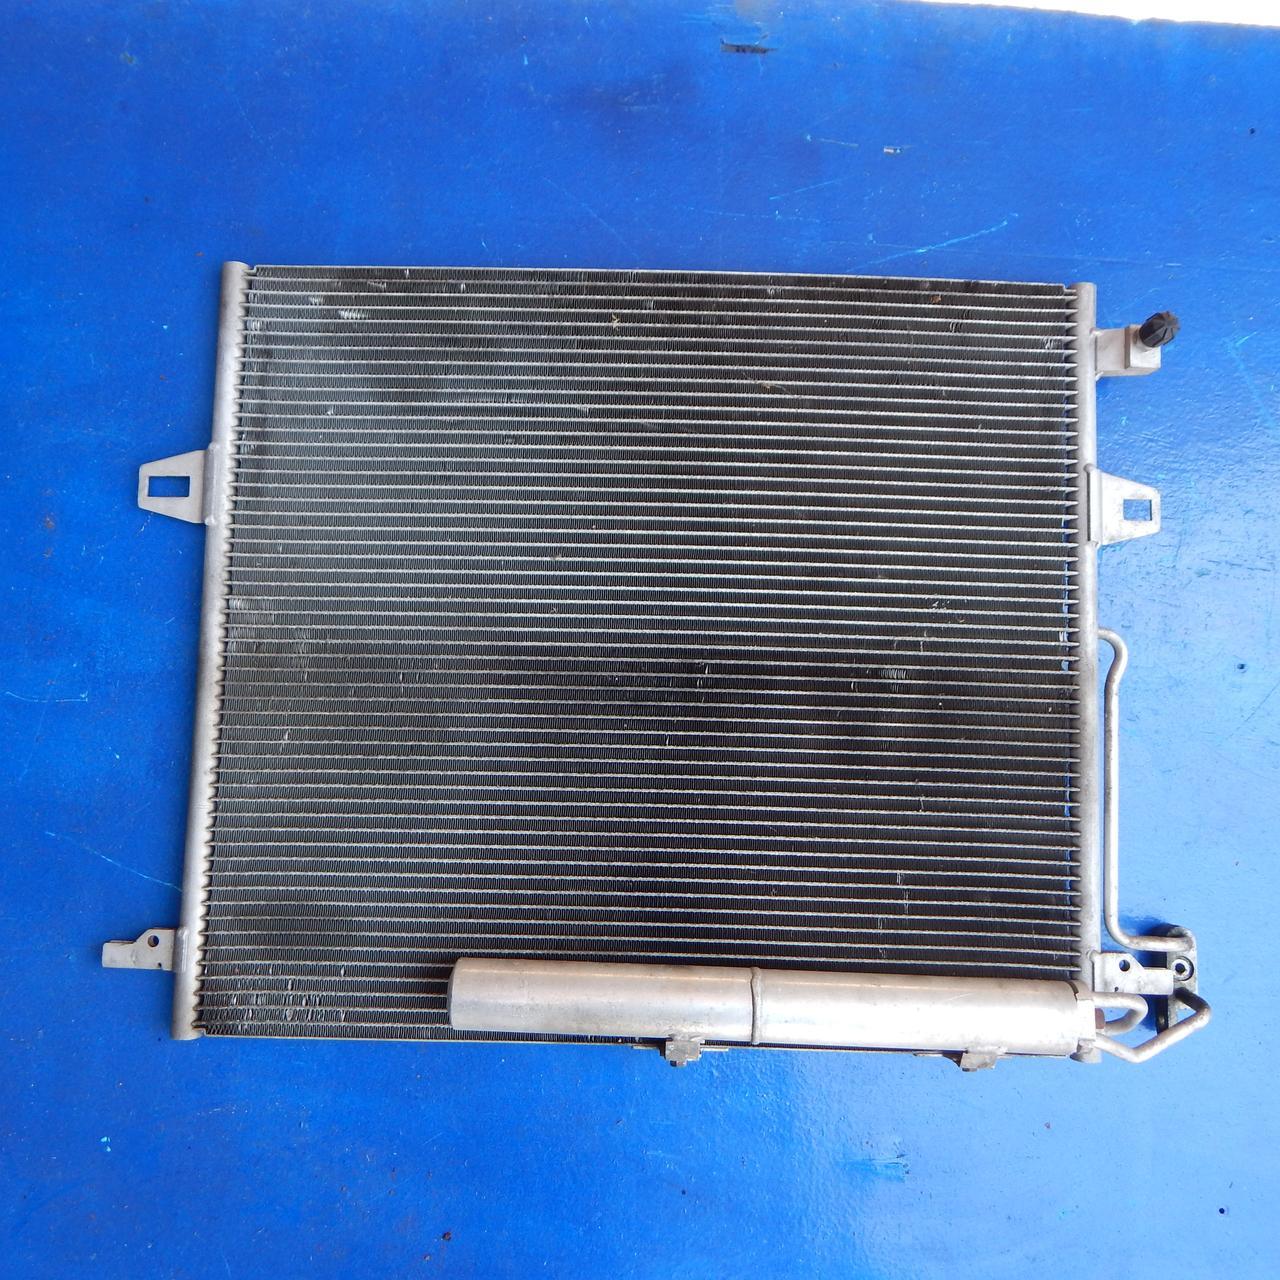 Радиатор кондиционера Mercedes ML МЛ W 164 A2515000054 2005-2011 гг Радіатор кондиціонера